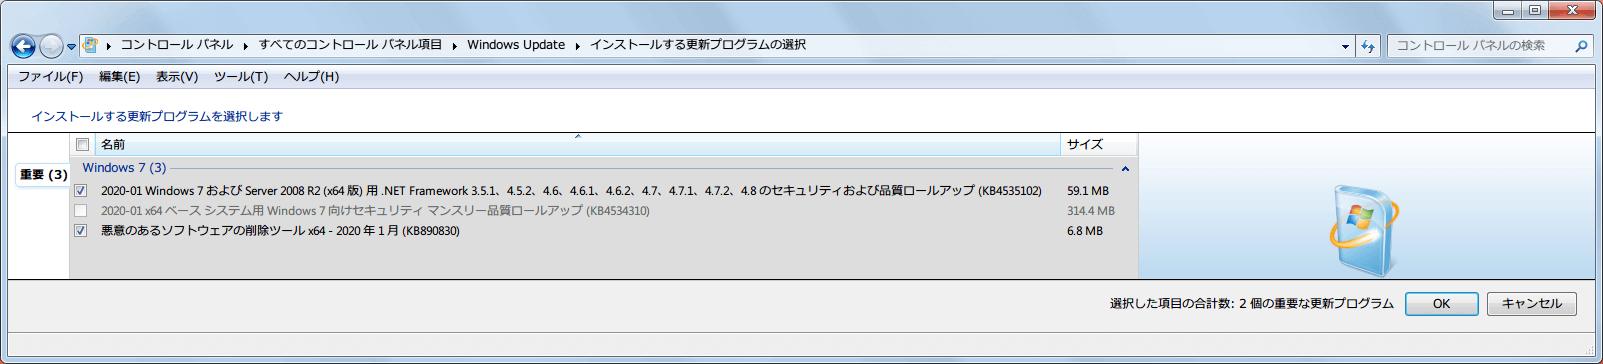 Windows 7 64bit Windows Update 重要 2020年1月分リスト KB4534310 非表示